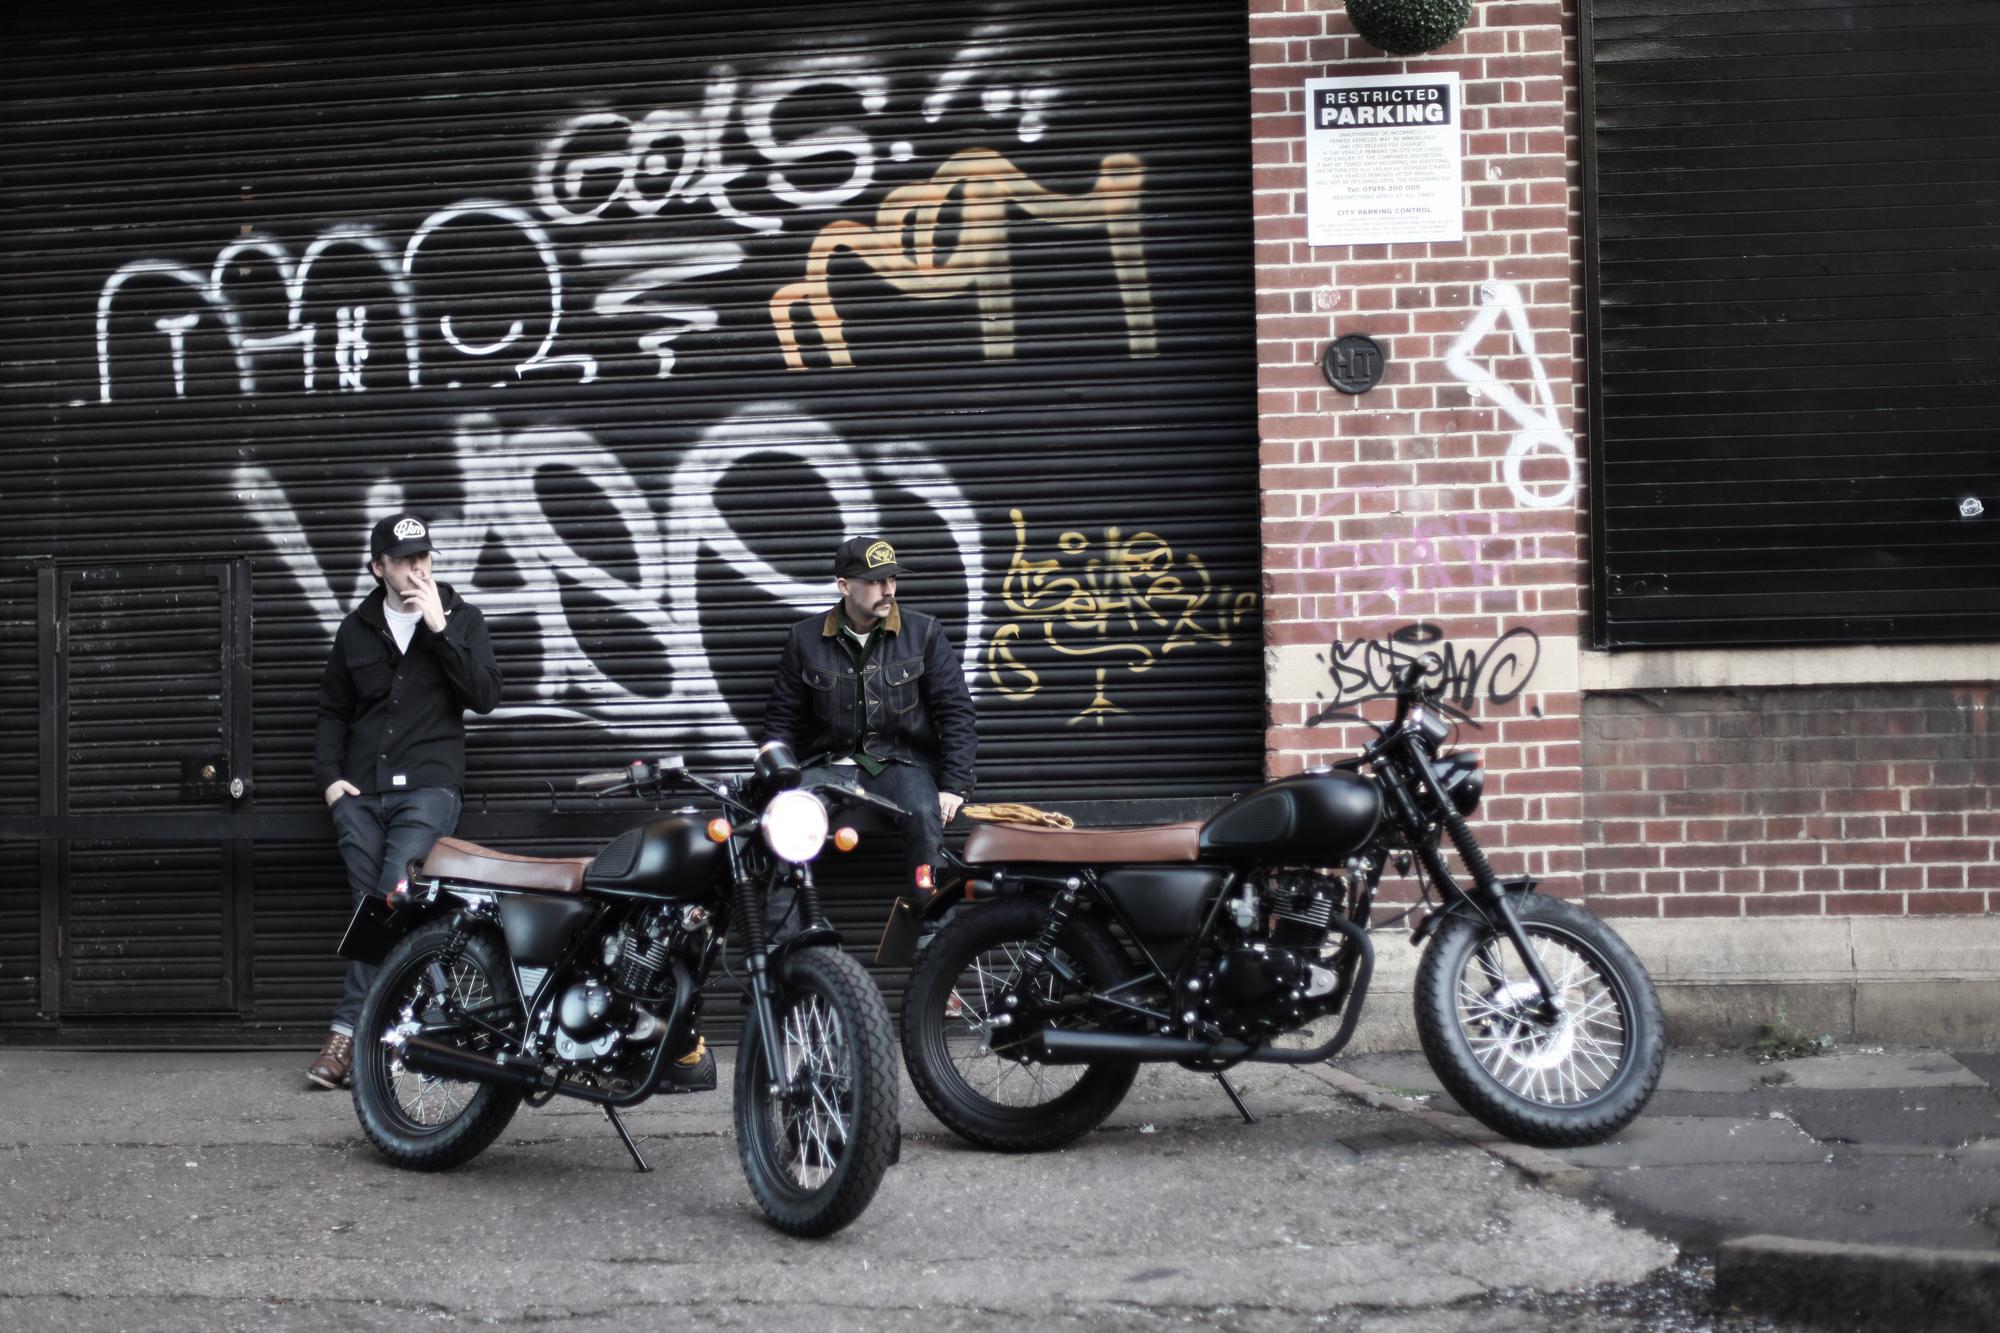 2017 Mutt Motorcycles range